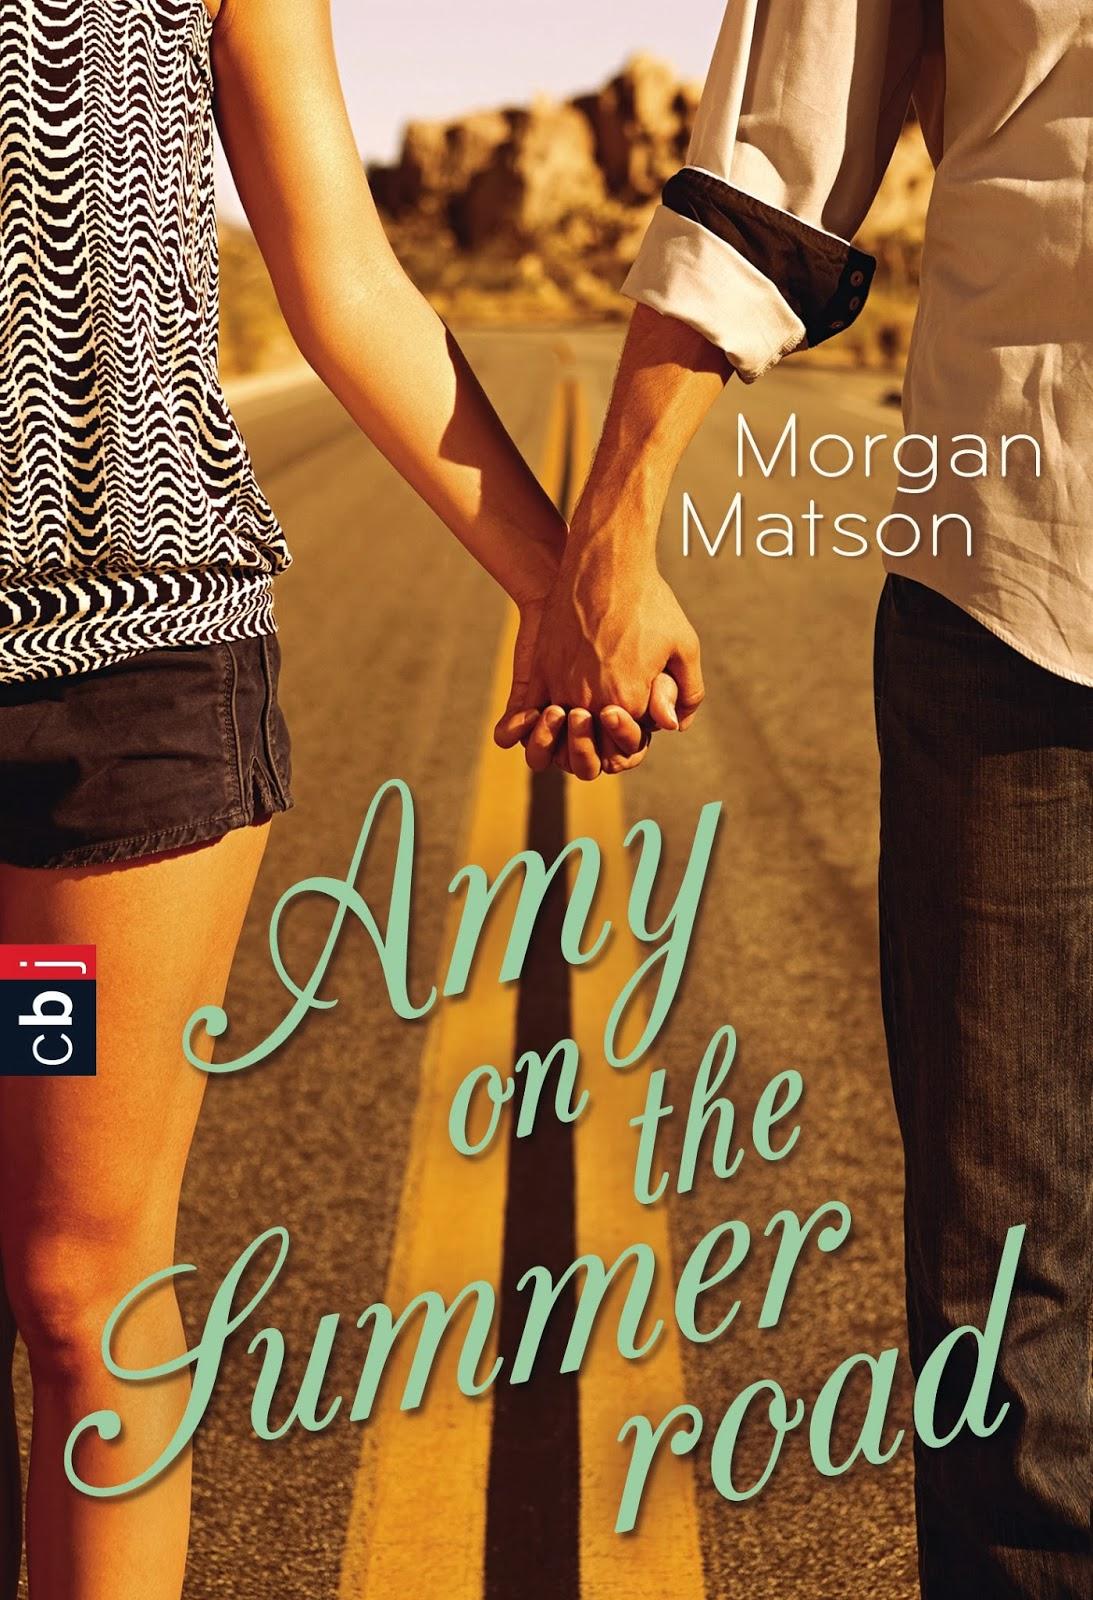 http://www.amazon.de/Amy-Summer-Road-Morgan-Matson/dp/3570401324/ref=tmm_pap_title_0?ie=UTF8&qid=1412529303&sr=1-1